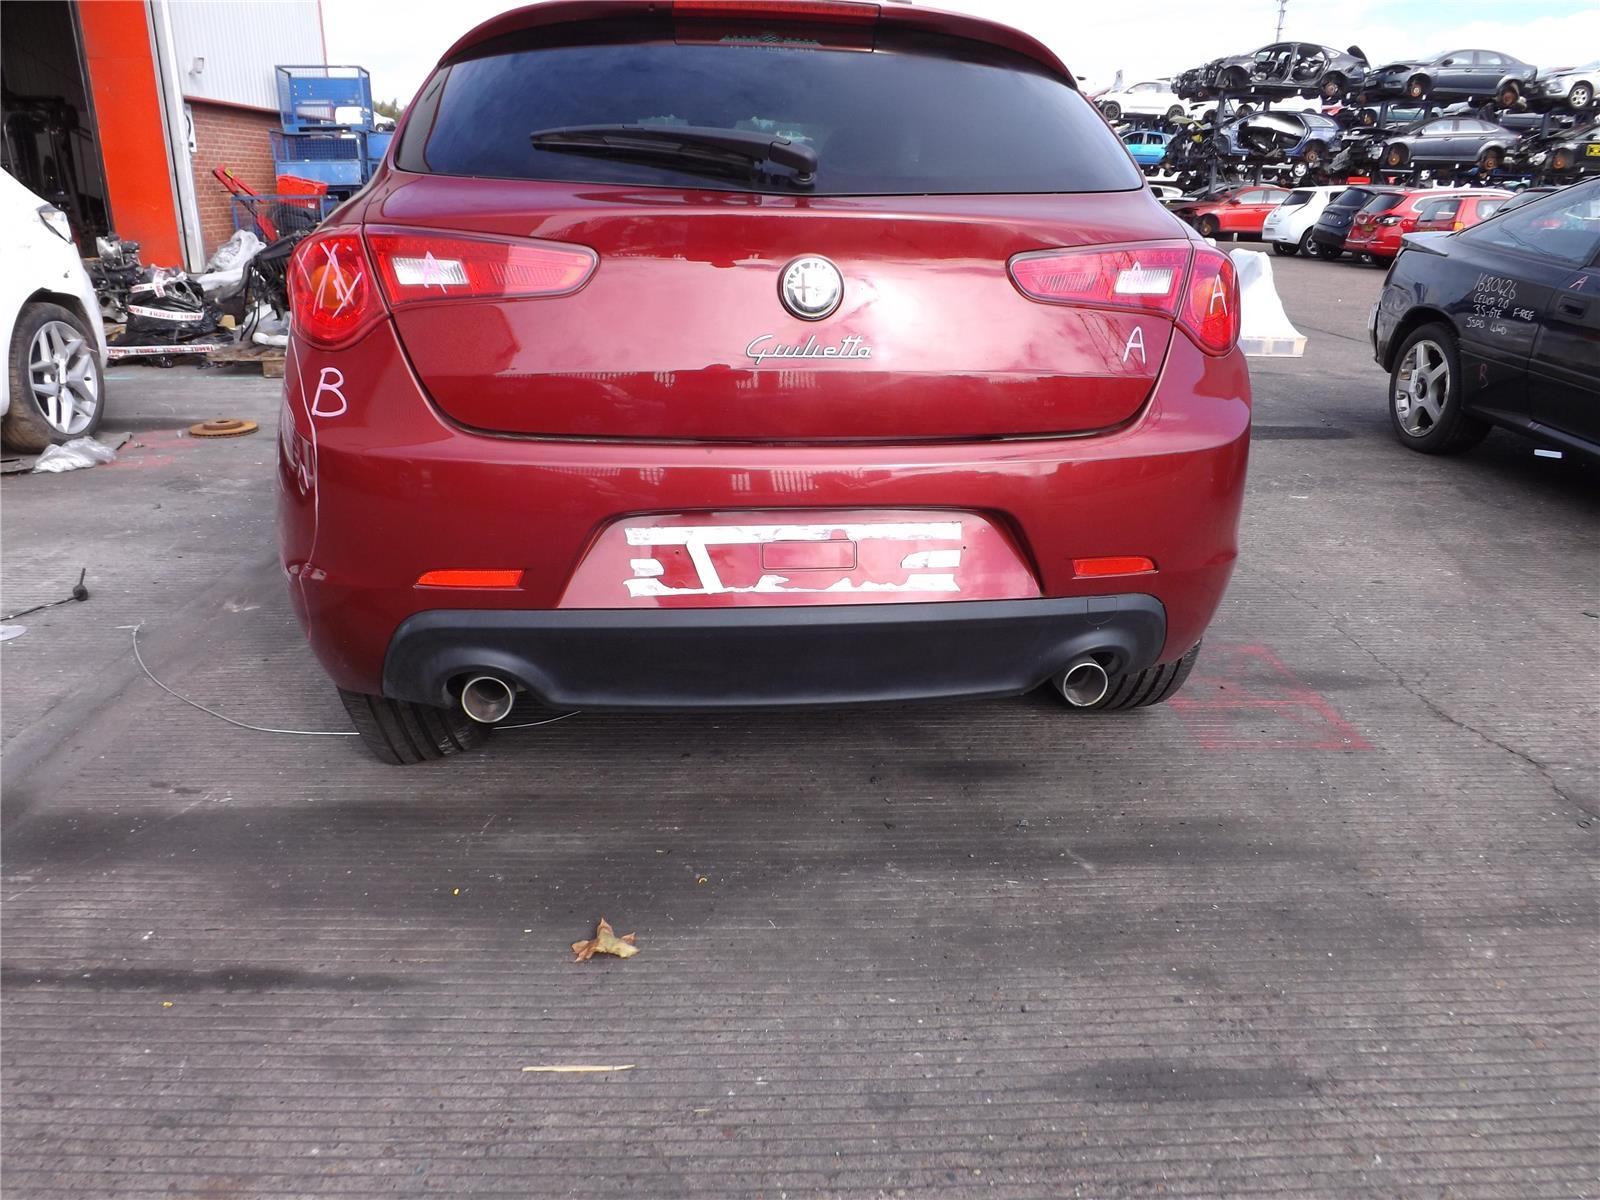 Alfa Romeo Giulietta 2010 To 2016 Bumper Rear Diesel Automatic 10 Sportiva Jtdm 5dr Hatchback Red 7377120